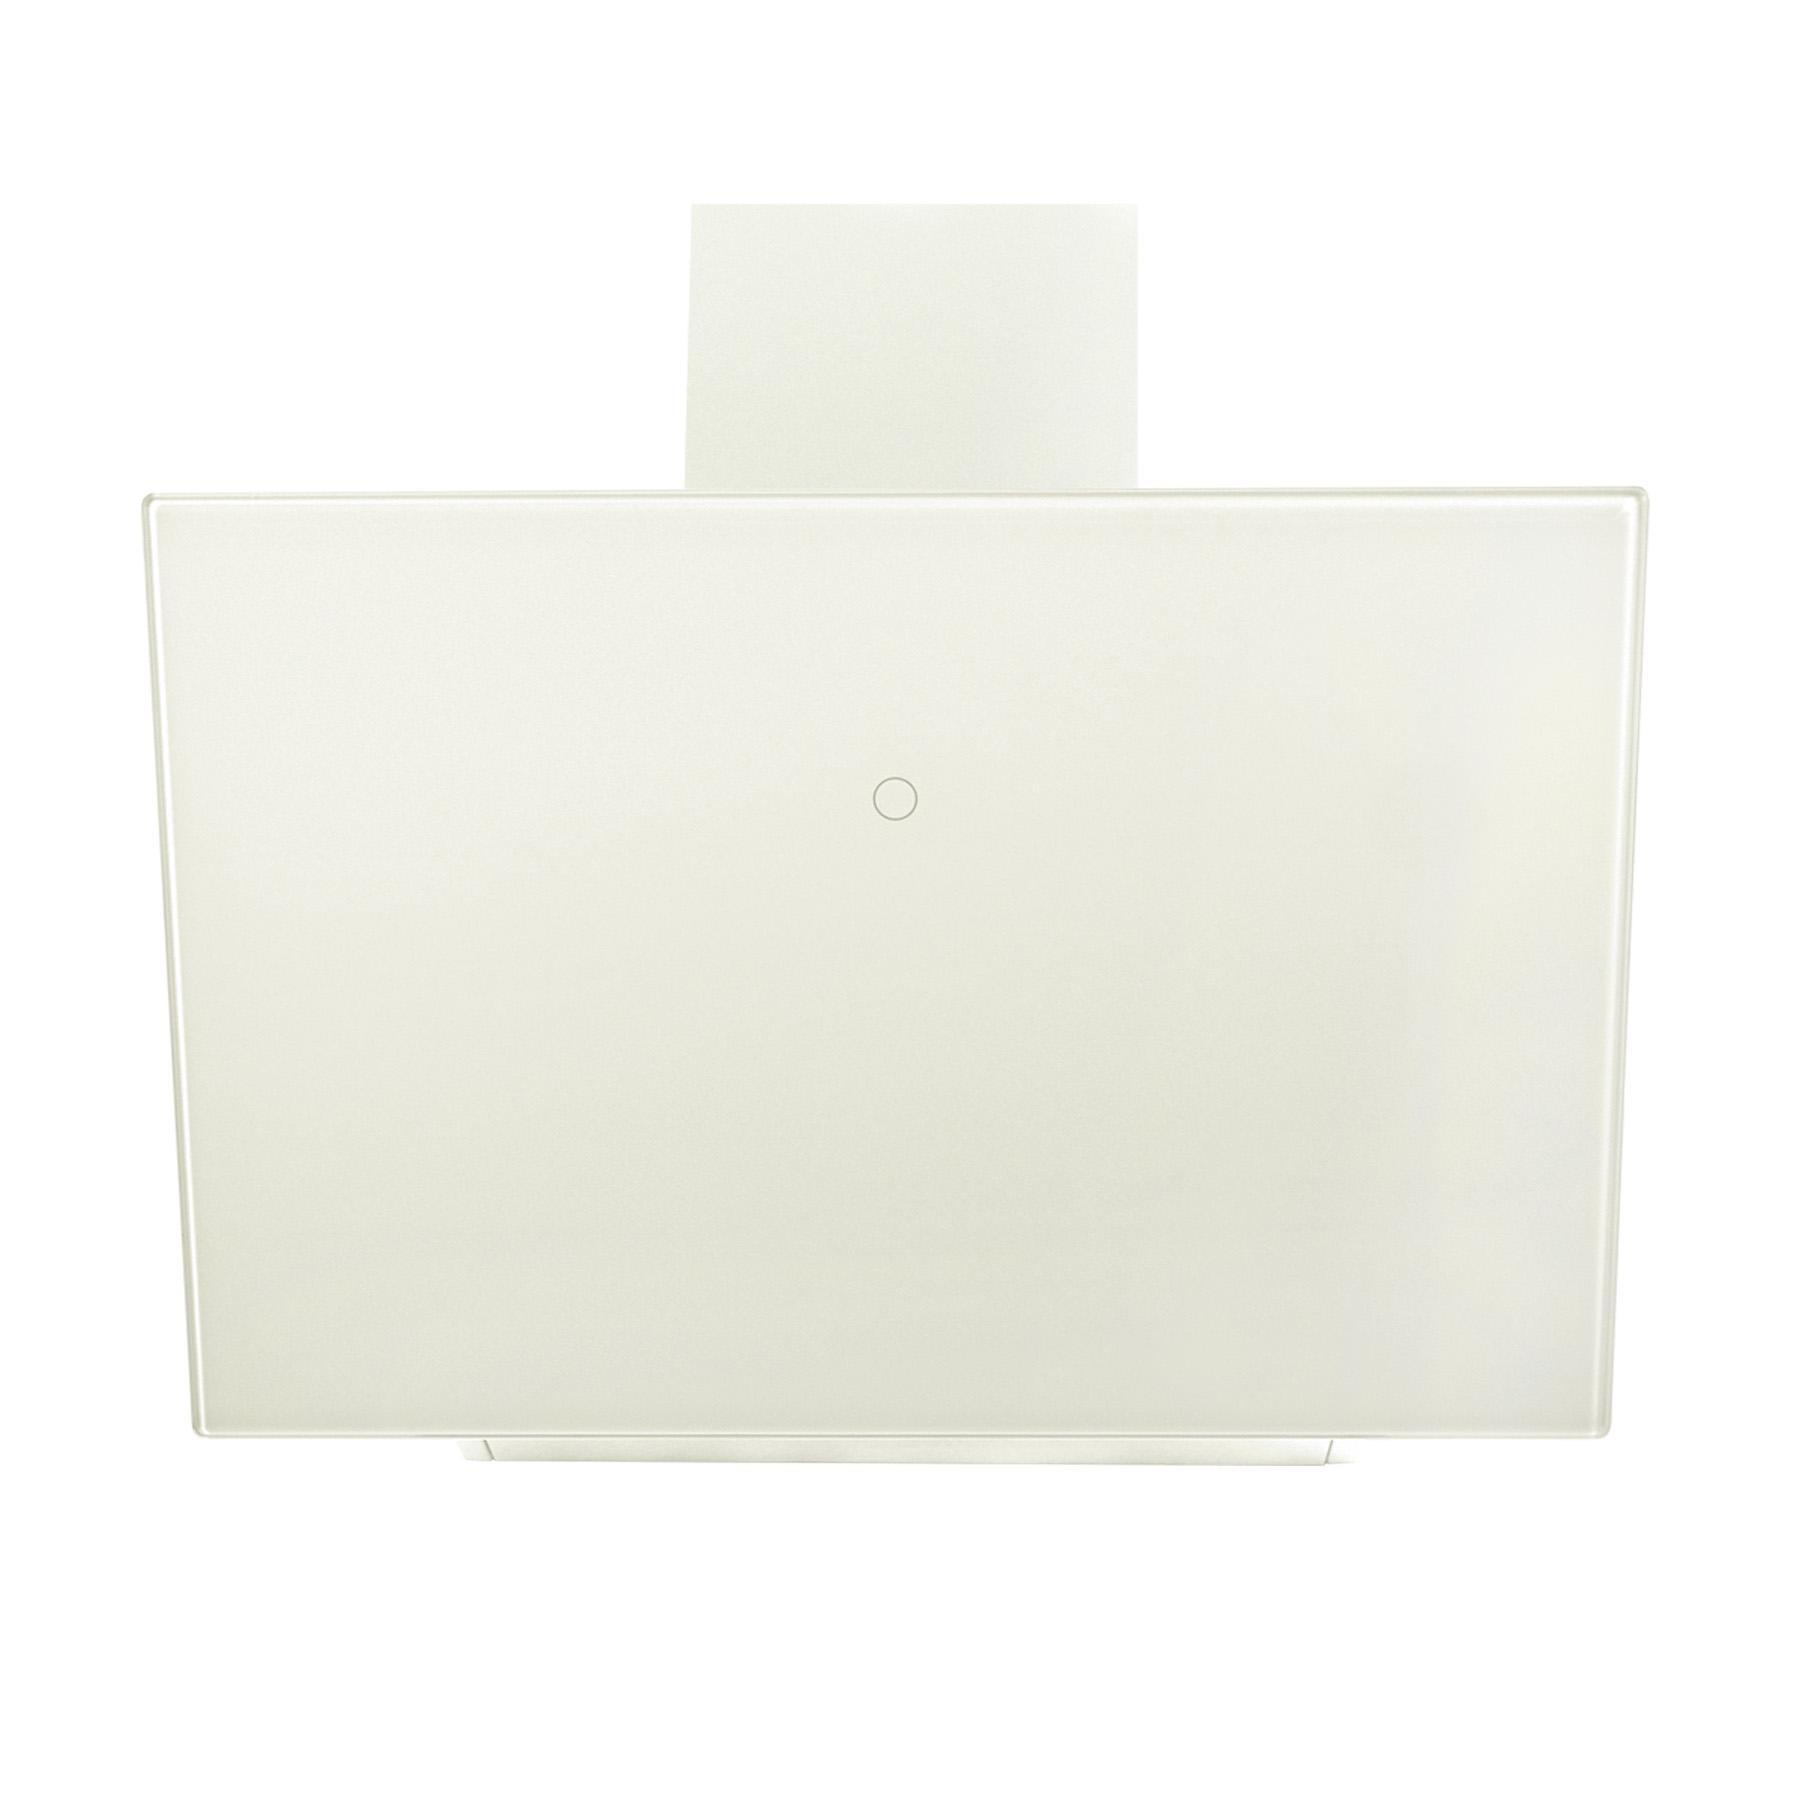 LEX Touch 600 Ivory Light